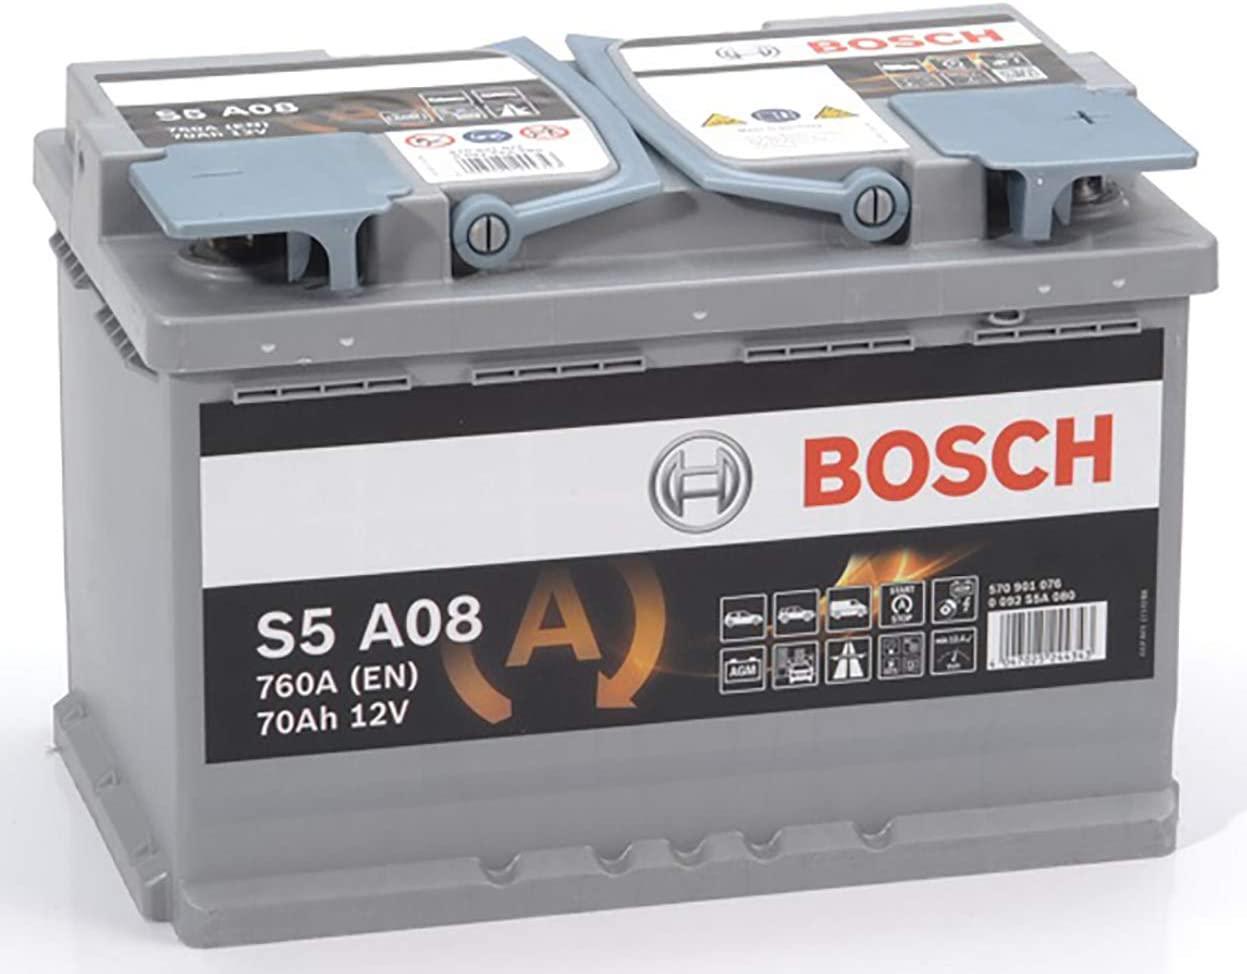 Bosch S5 A08 car battery AGM Stop Start - £115.86 @ Amazon / Amazon EU (Mainland UK)